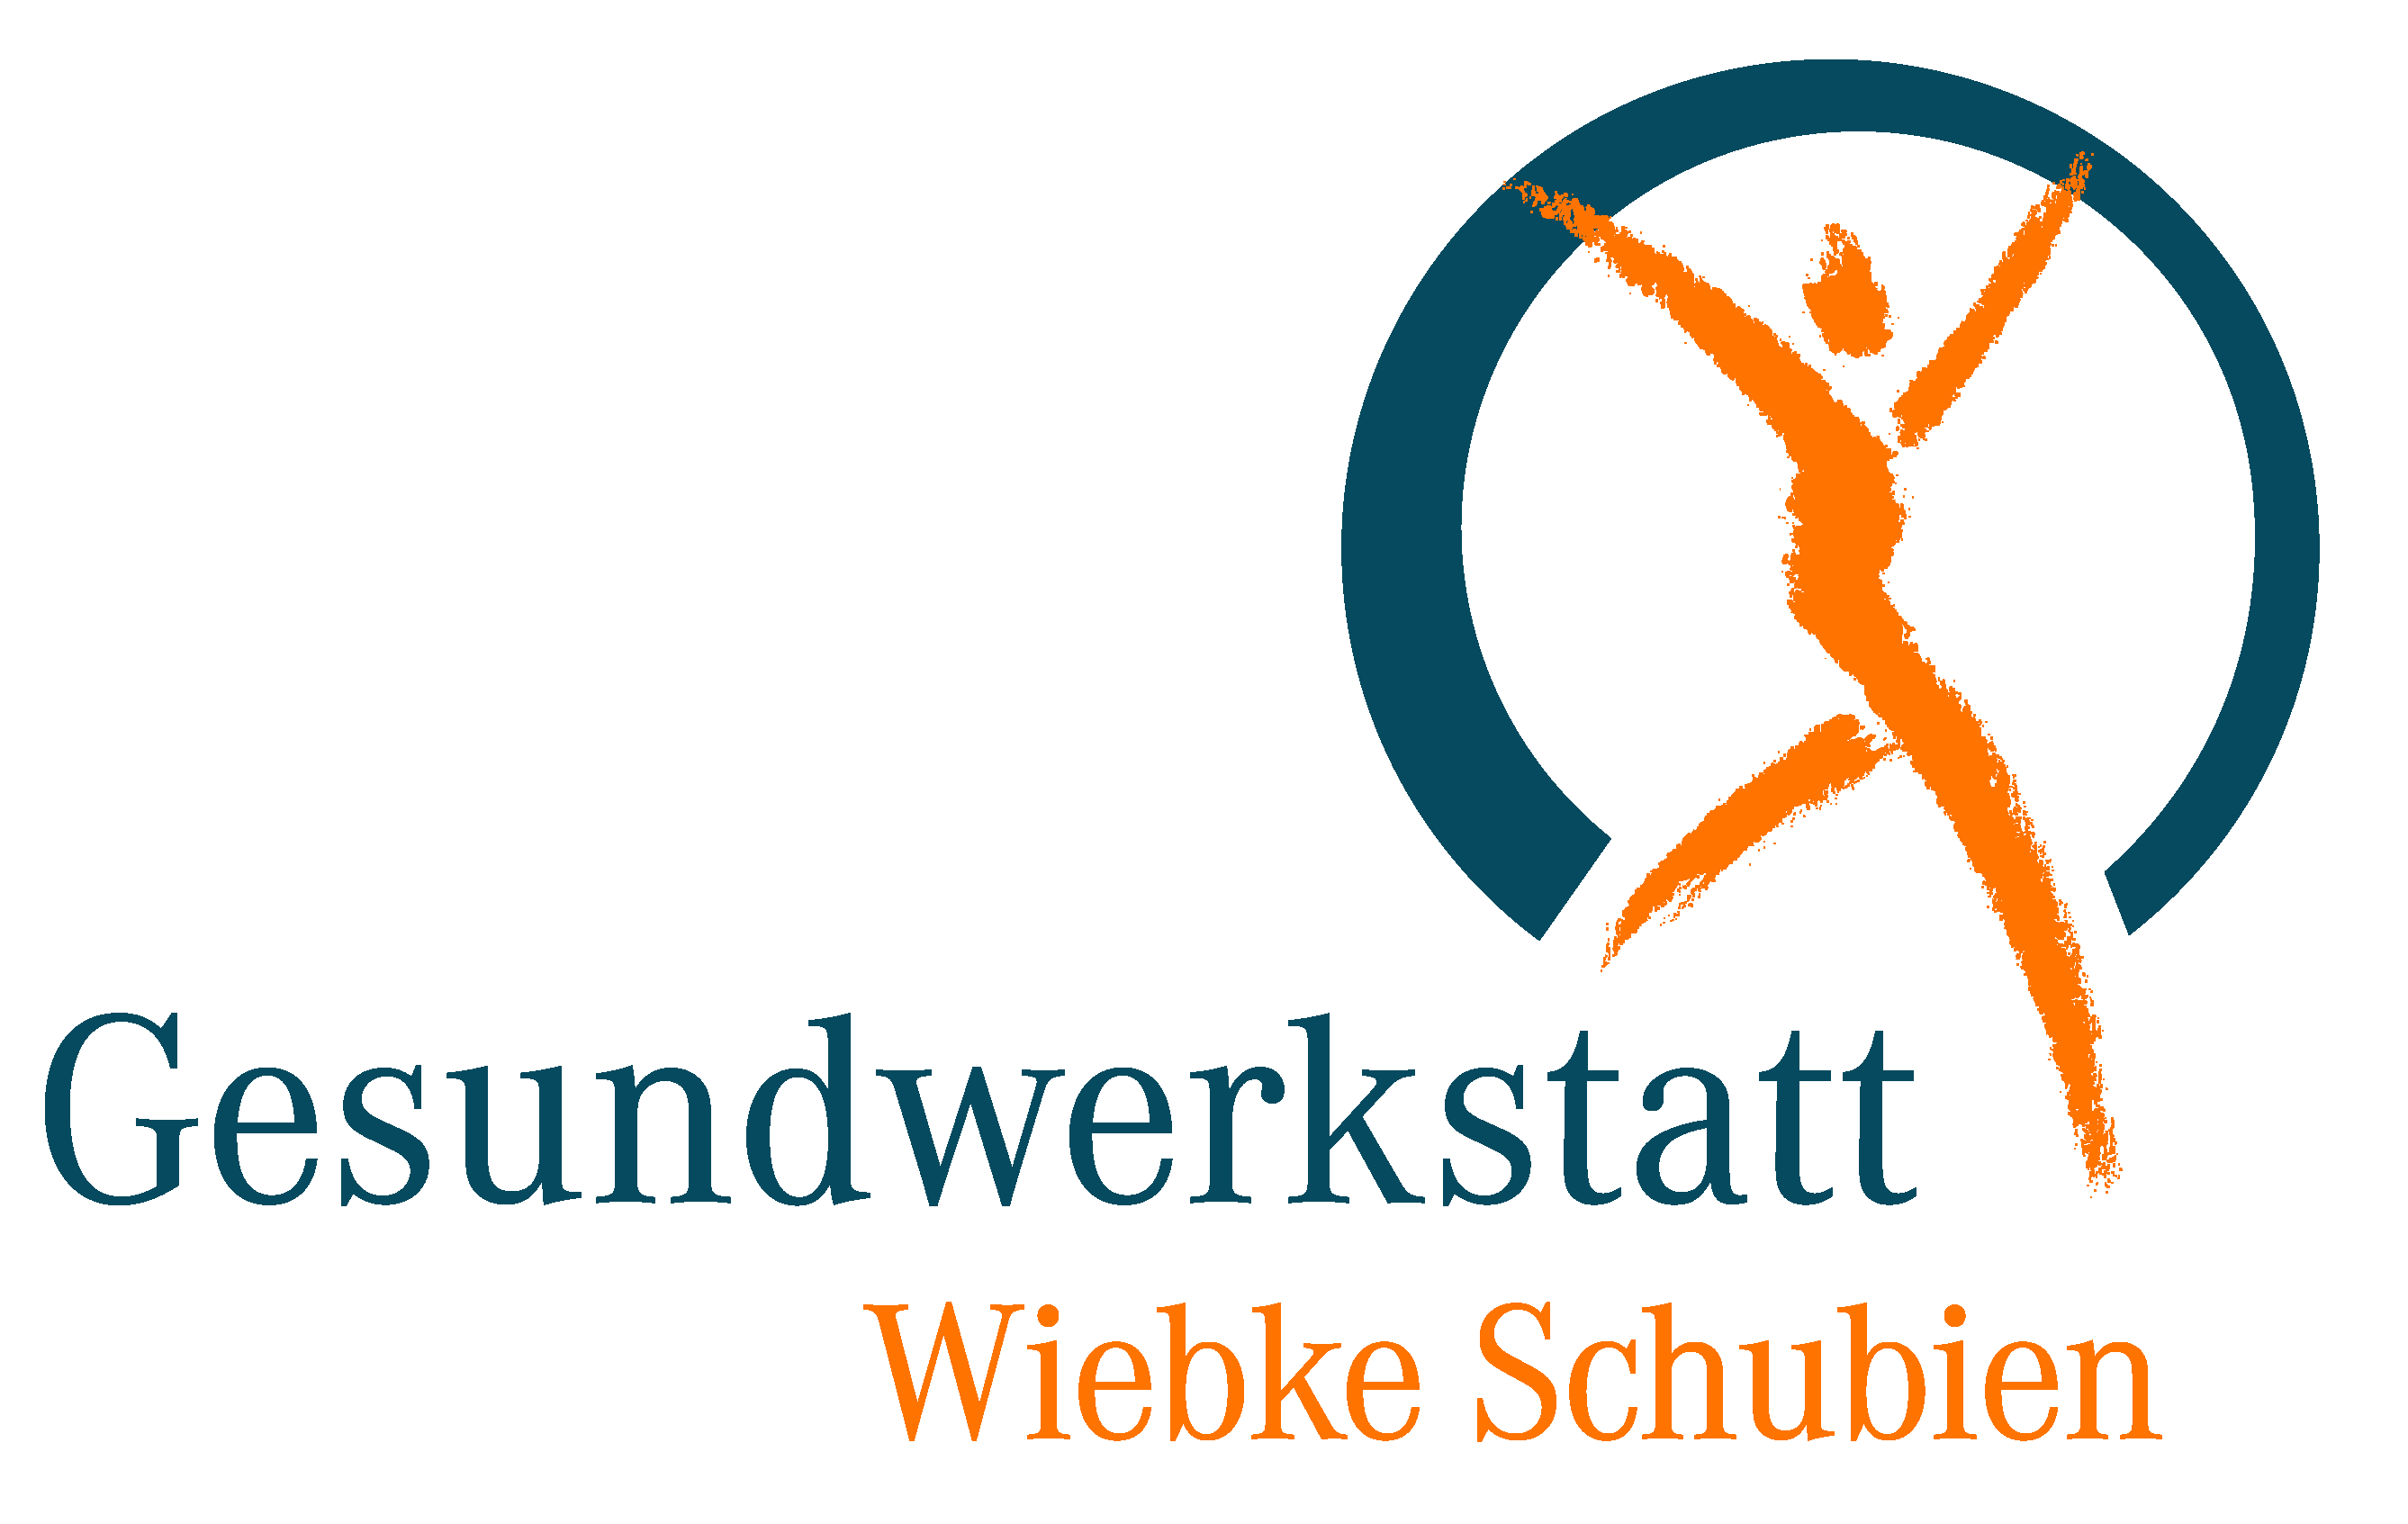 Gesundwerkstatt – Wiebke Schubien Logo